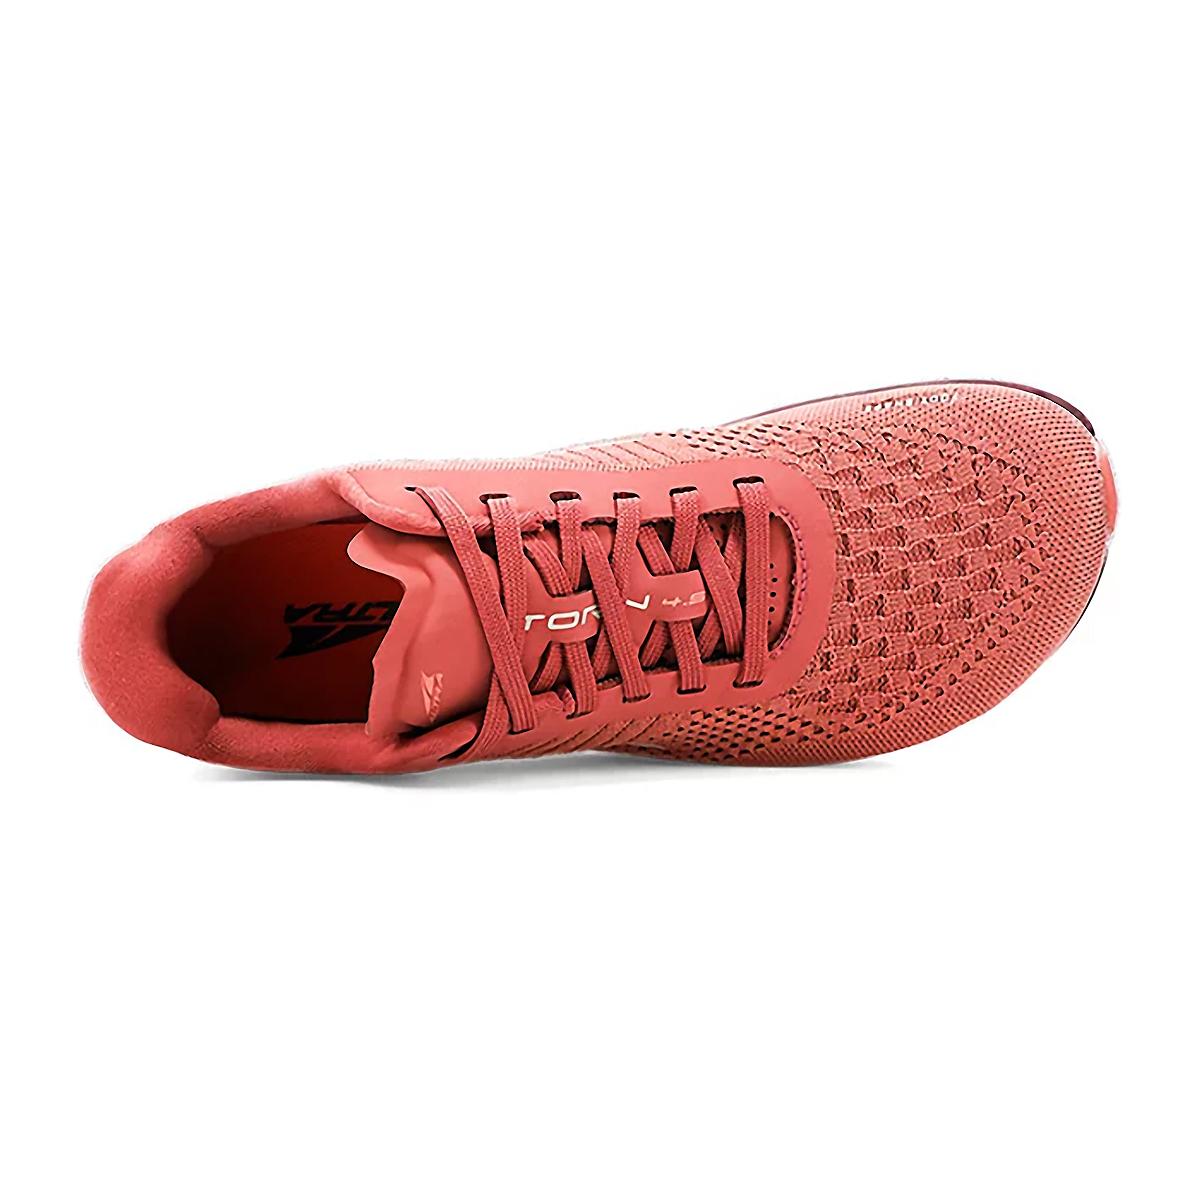 Women's Altra Torin 4.5 Plush Running Shoe - Color: Misty Rose - Size: 5.5 - Width: Regular, Misty Rose, large, image 3